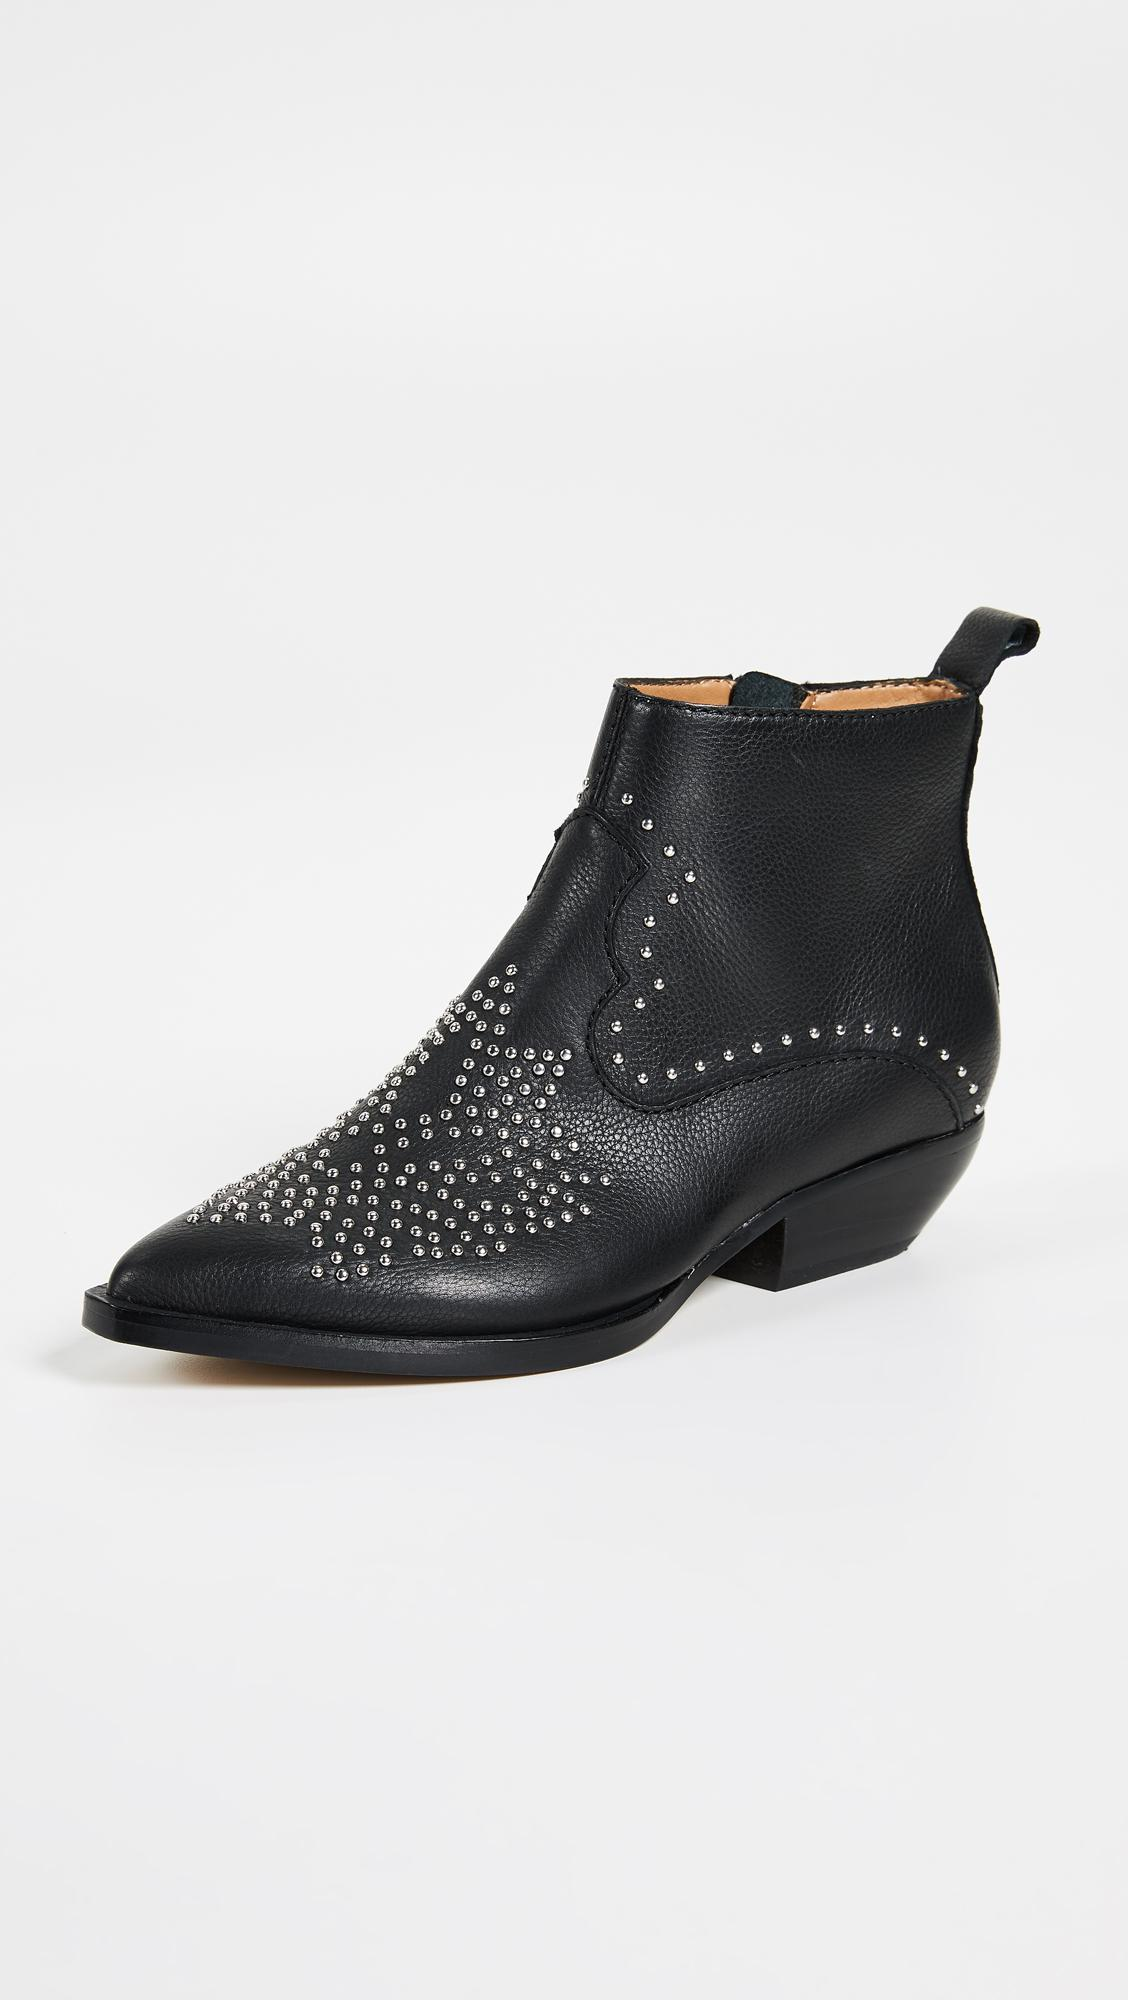 Uma Studded Chelsea Western Inspired Booties h23XVXNjSY